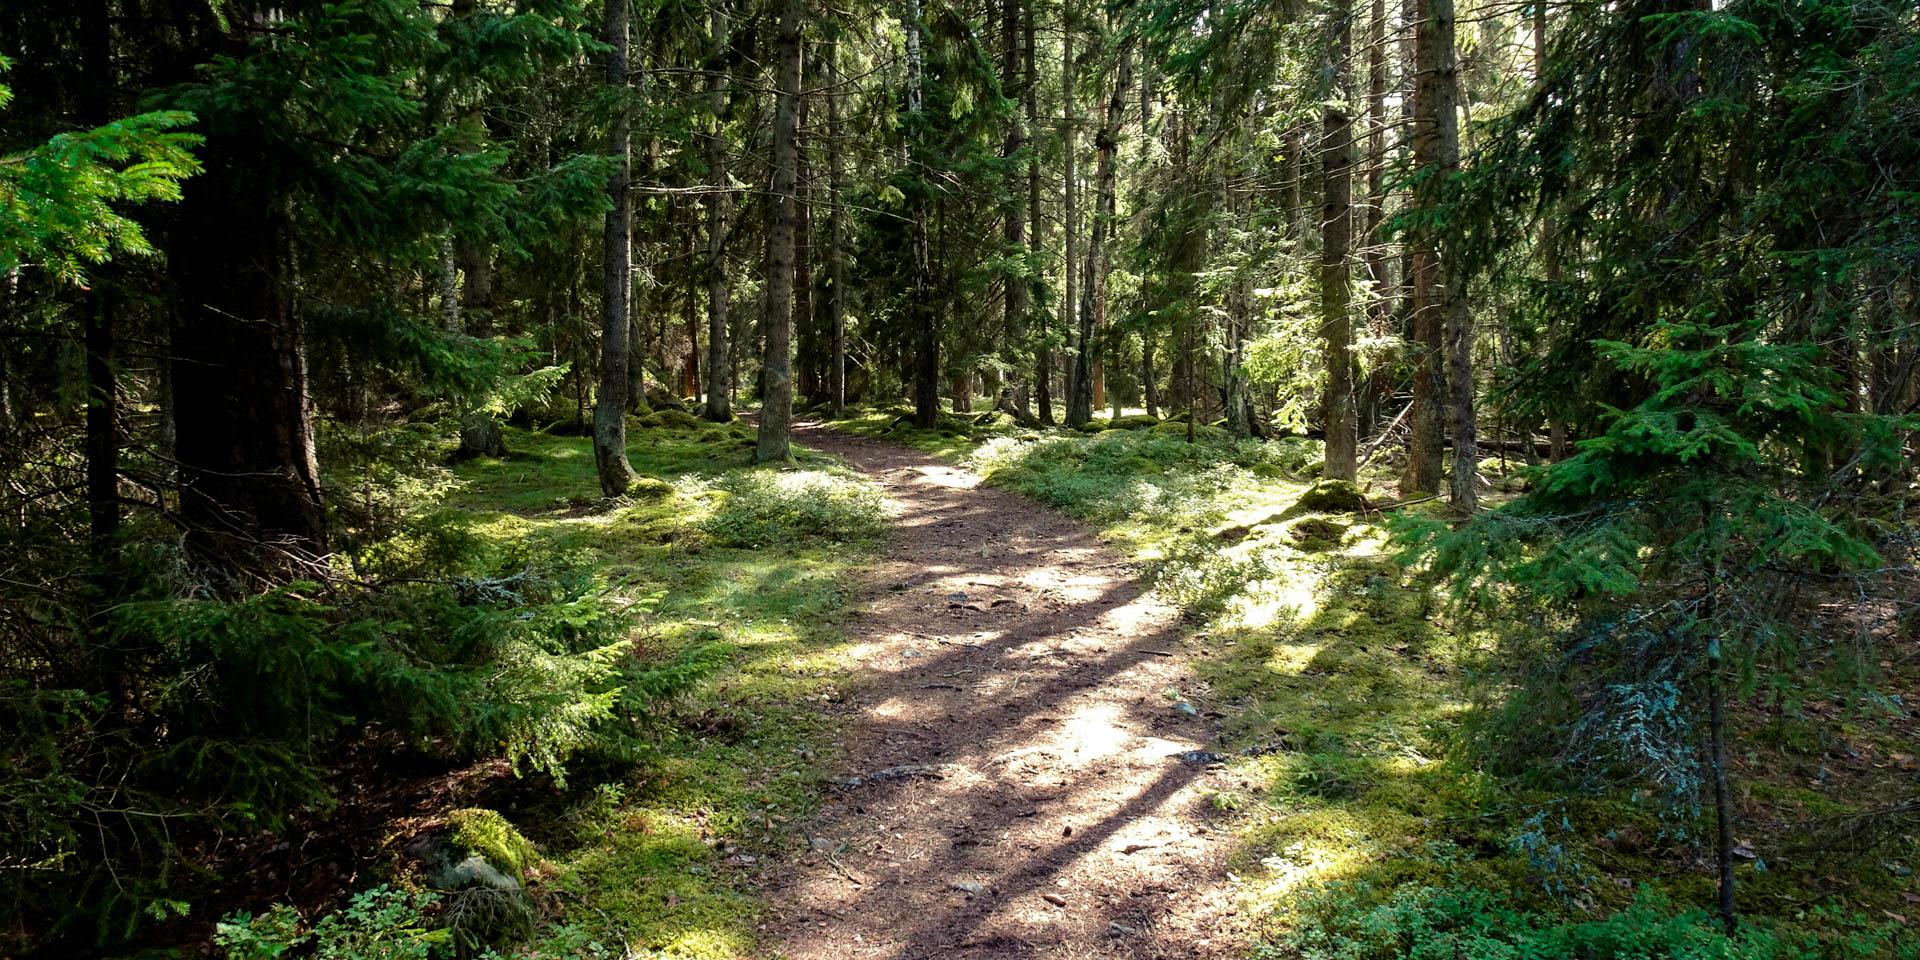 Adelsö-Sättra Naturreservat 2016